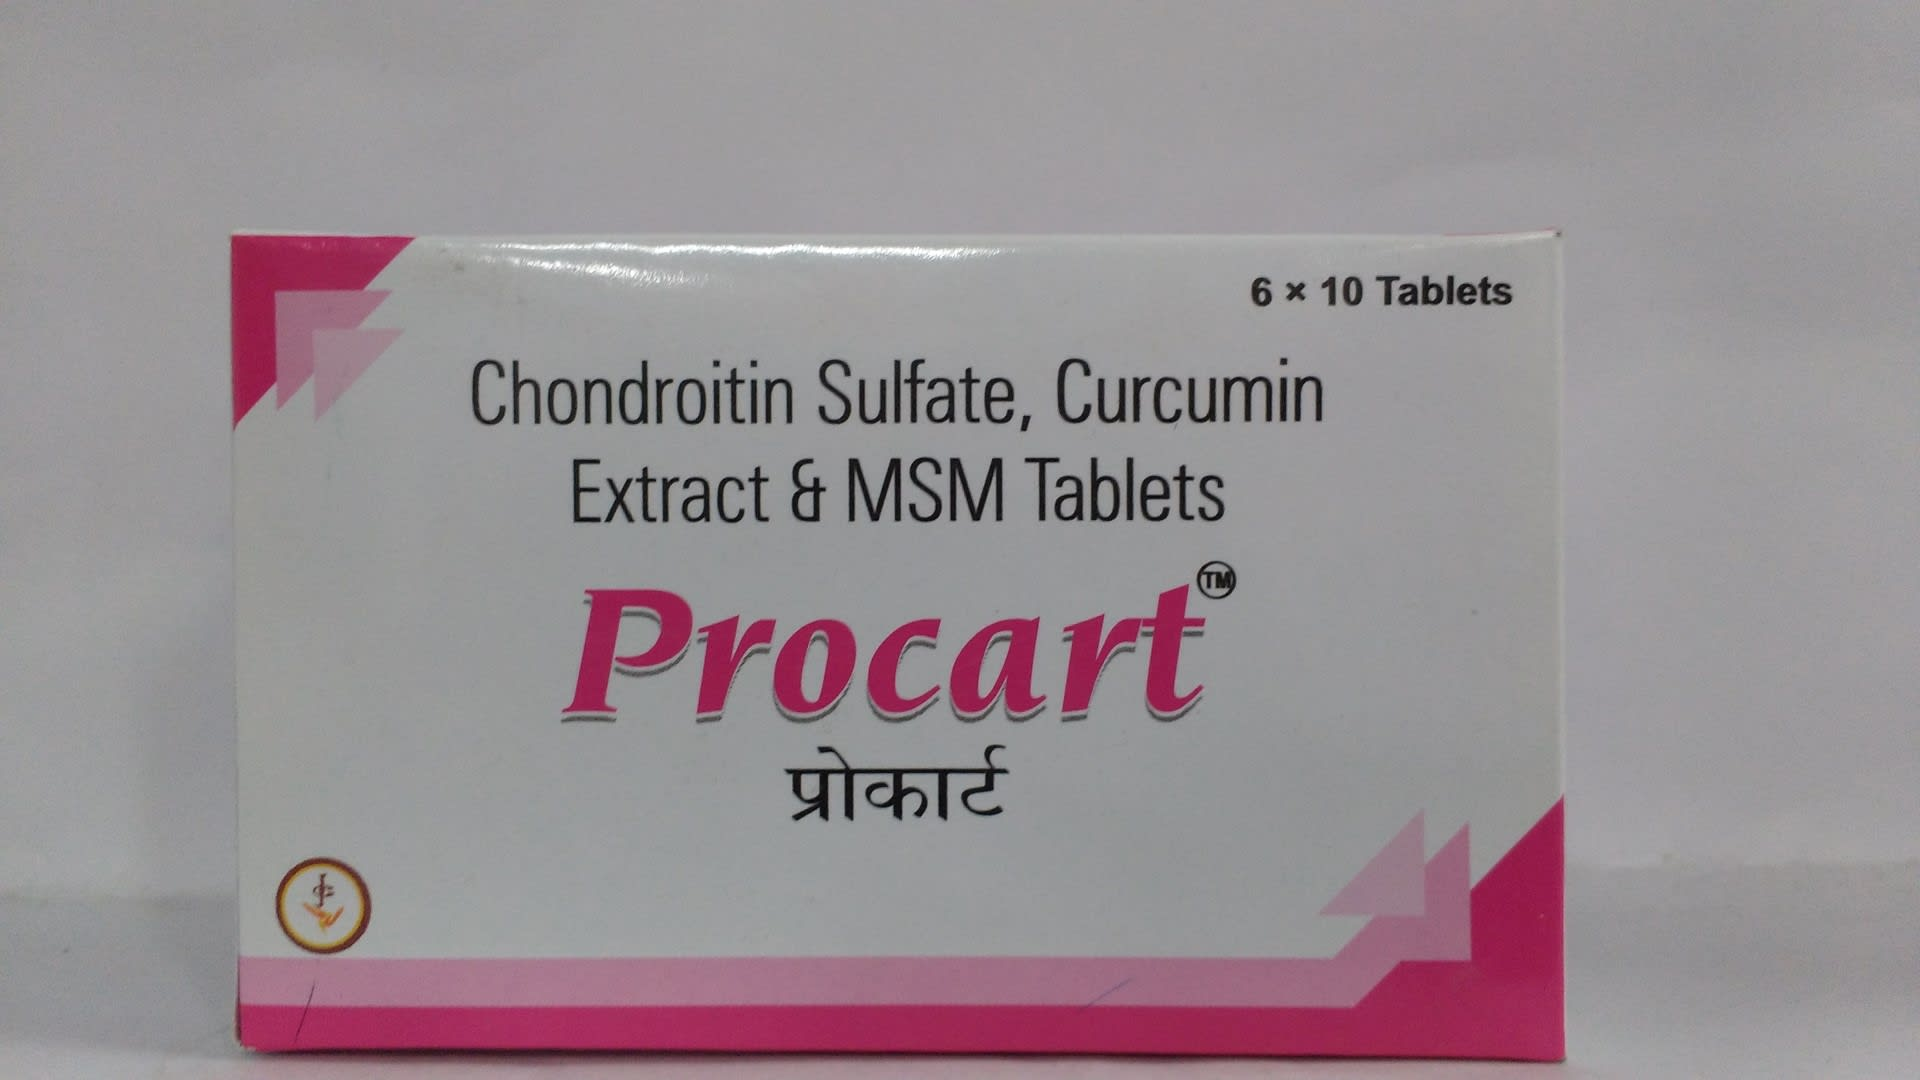 Procart Tablet